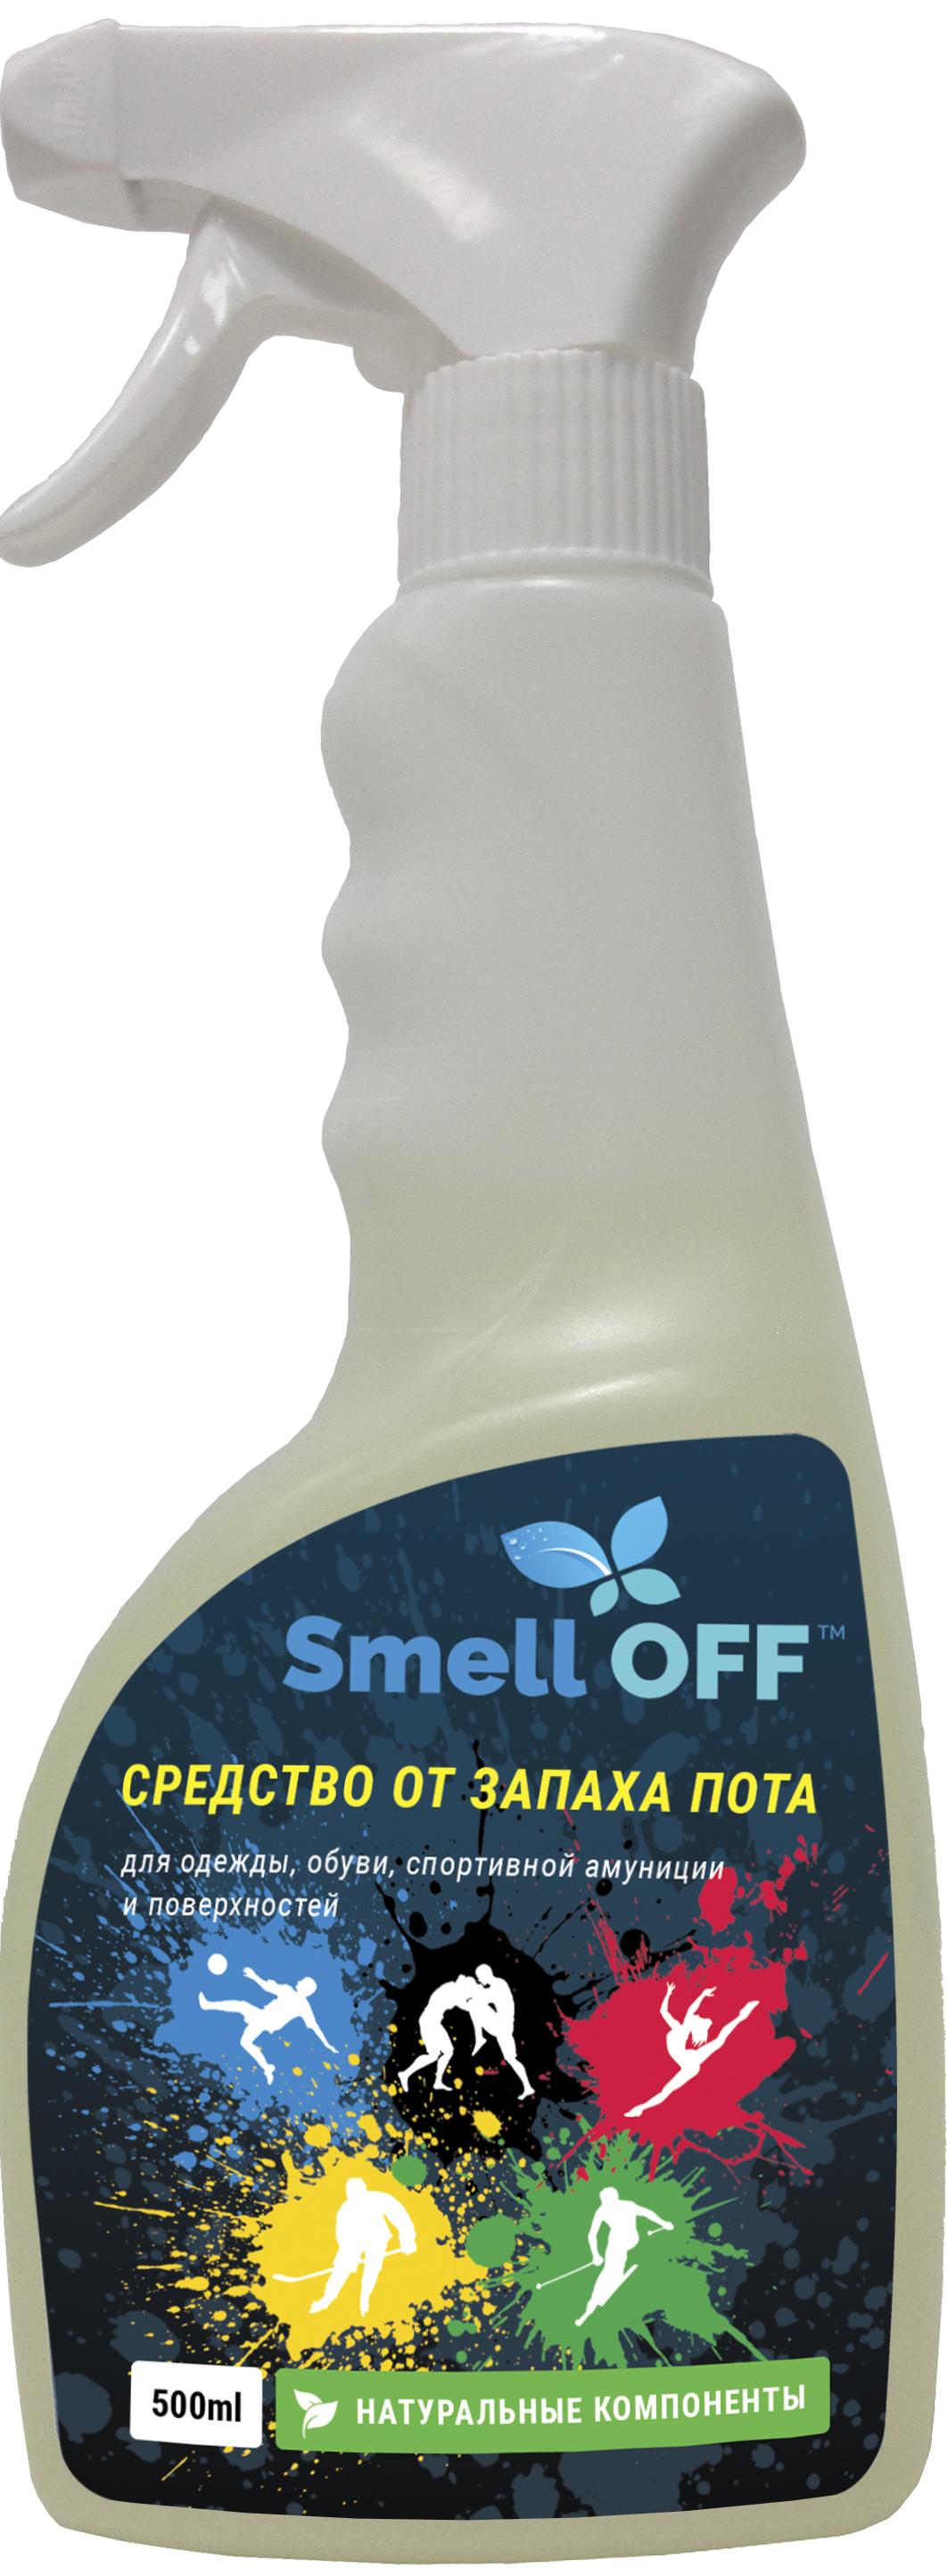 SmellOFF от запаха потаНейтрализаторы запахов<br><br>